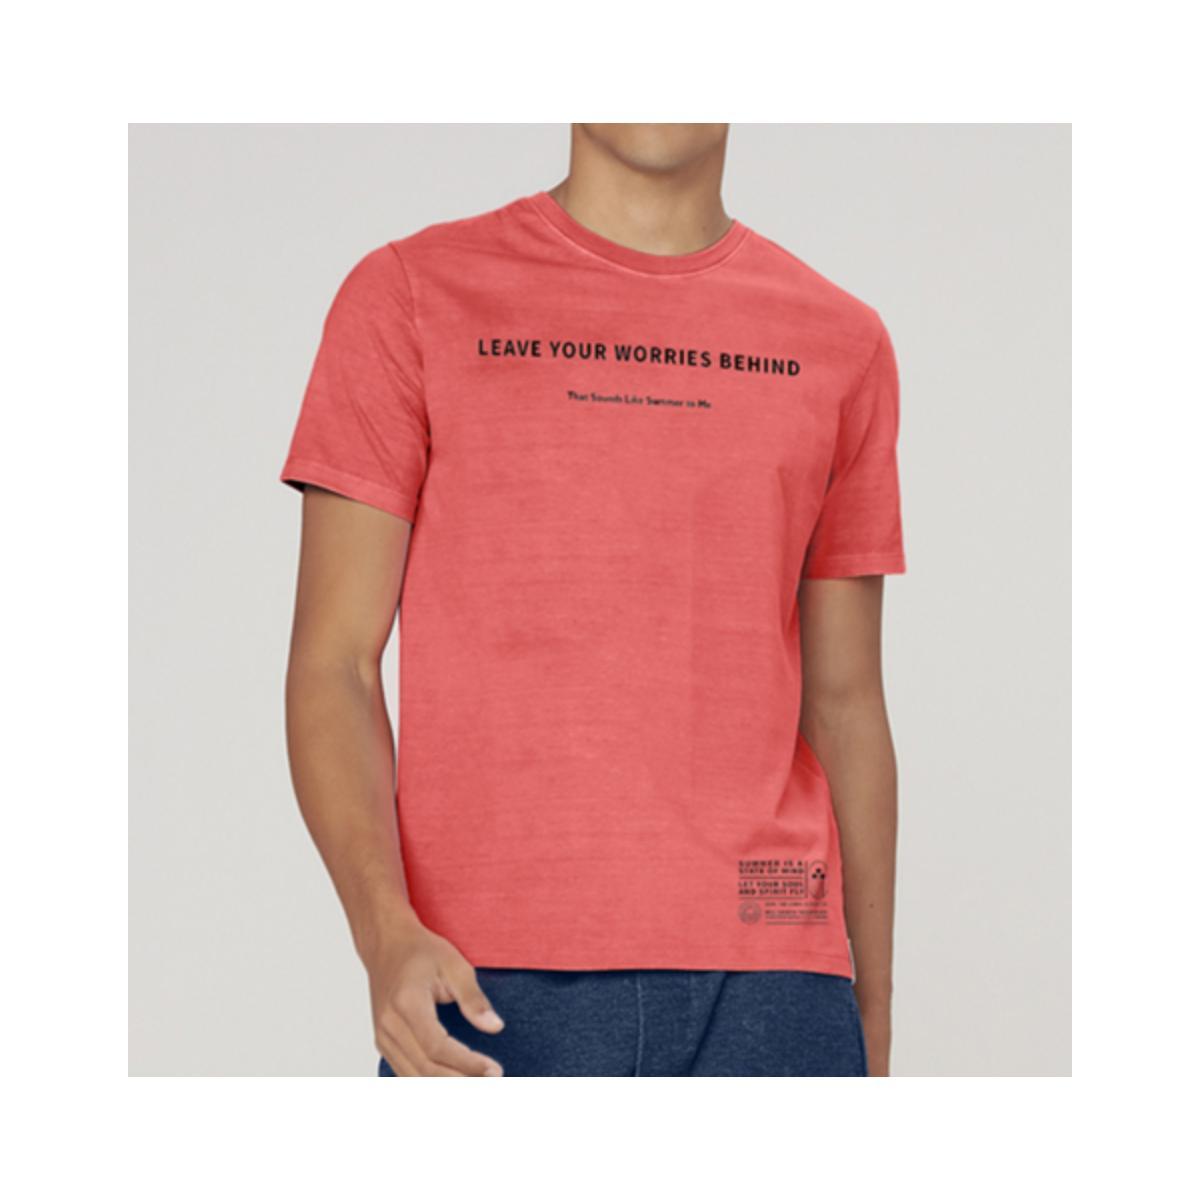 Camiseta Masculina Dzarm 6r8e 1cen Coral